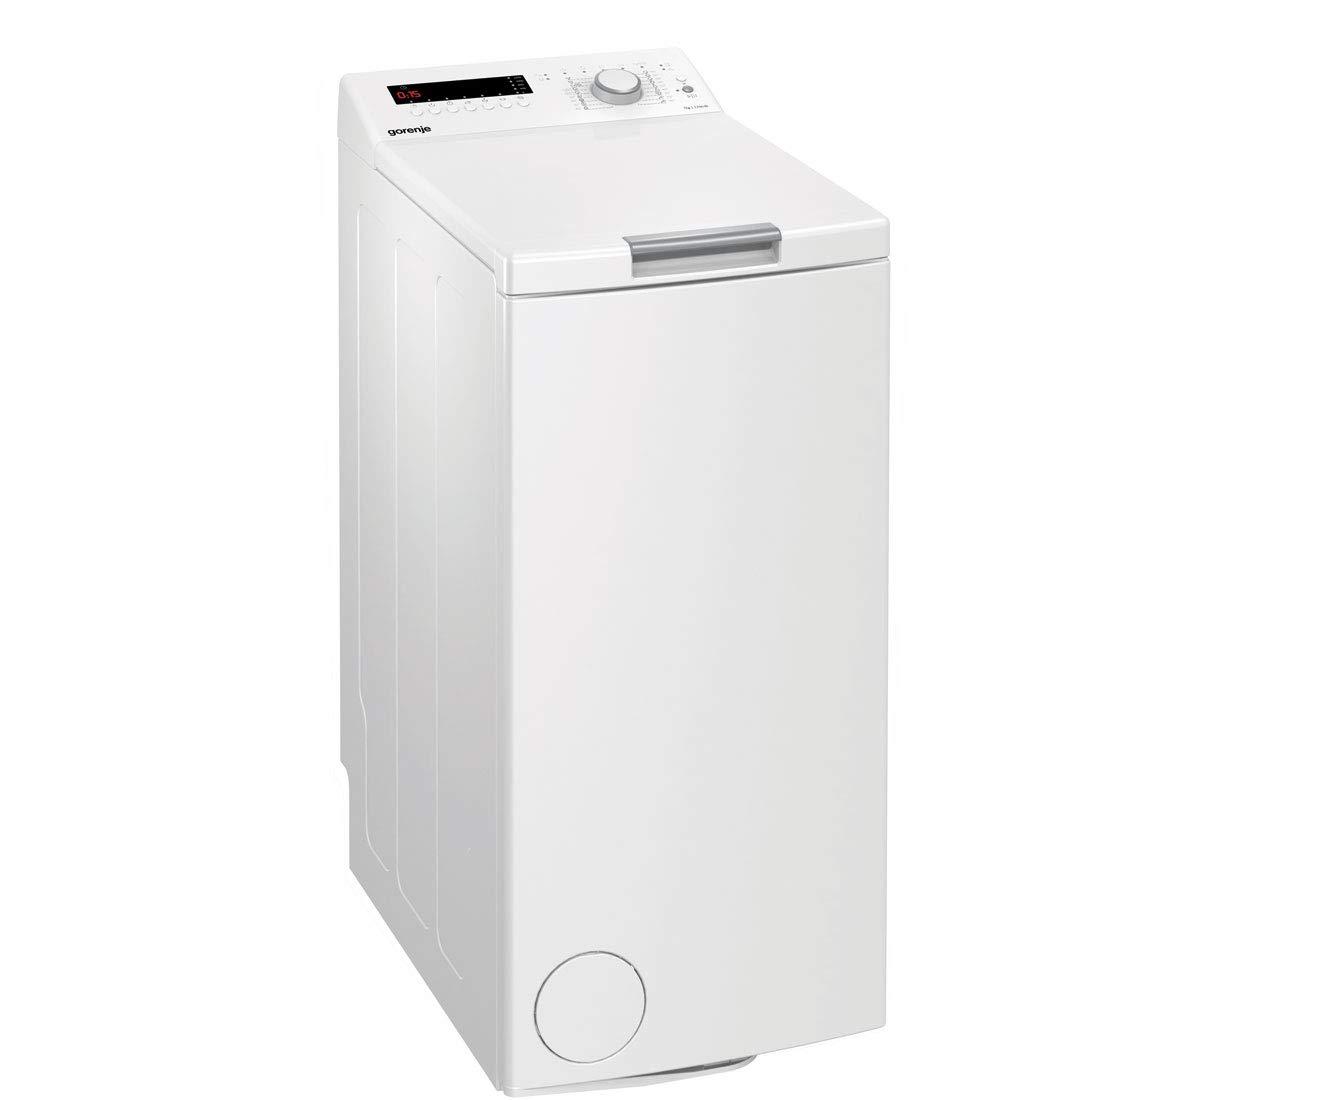 gorenje-WT72122-Waschmaschine-wei